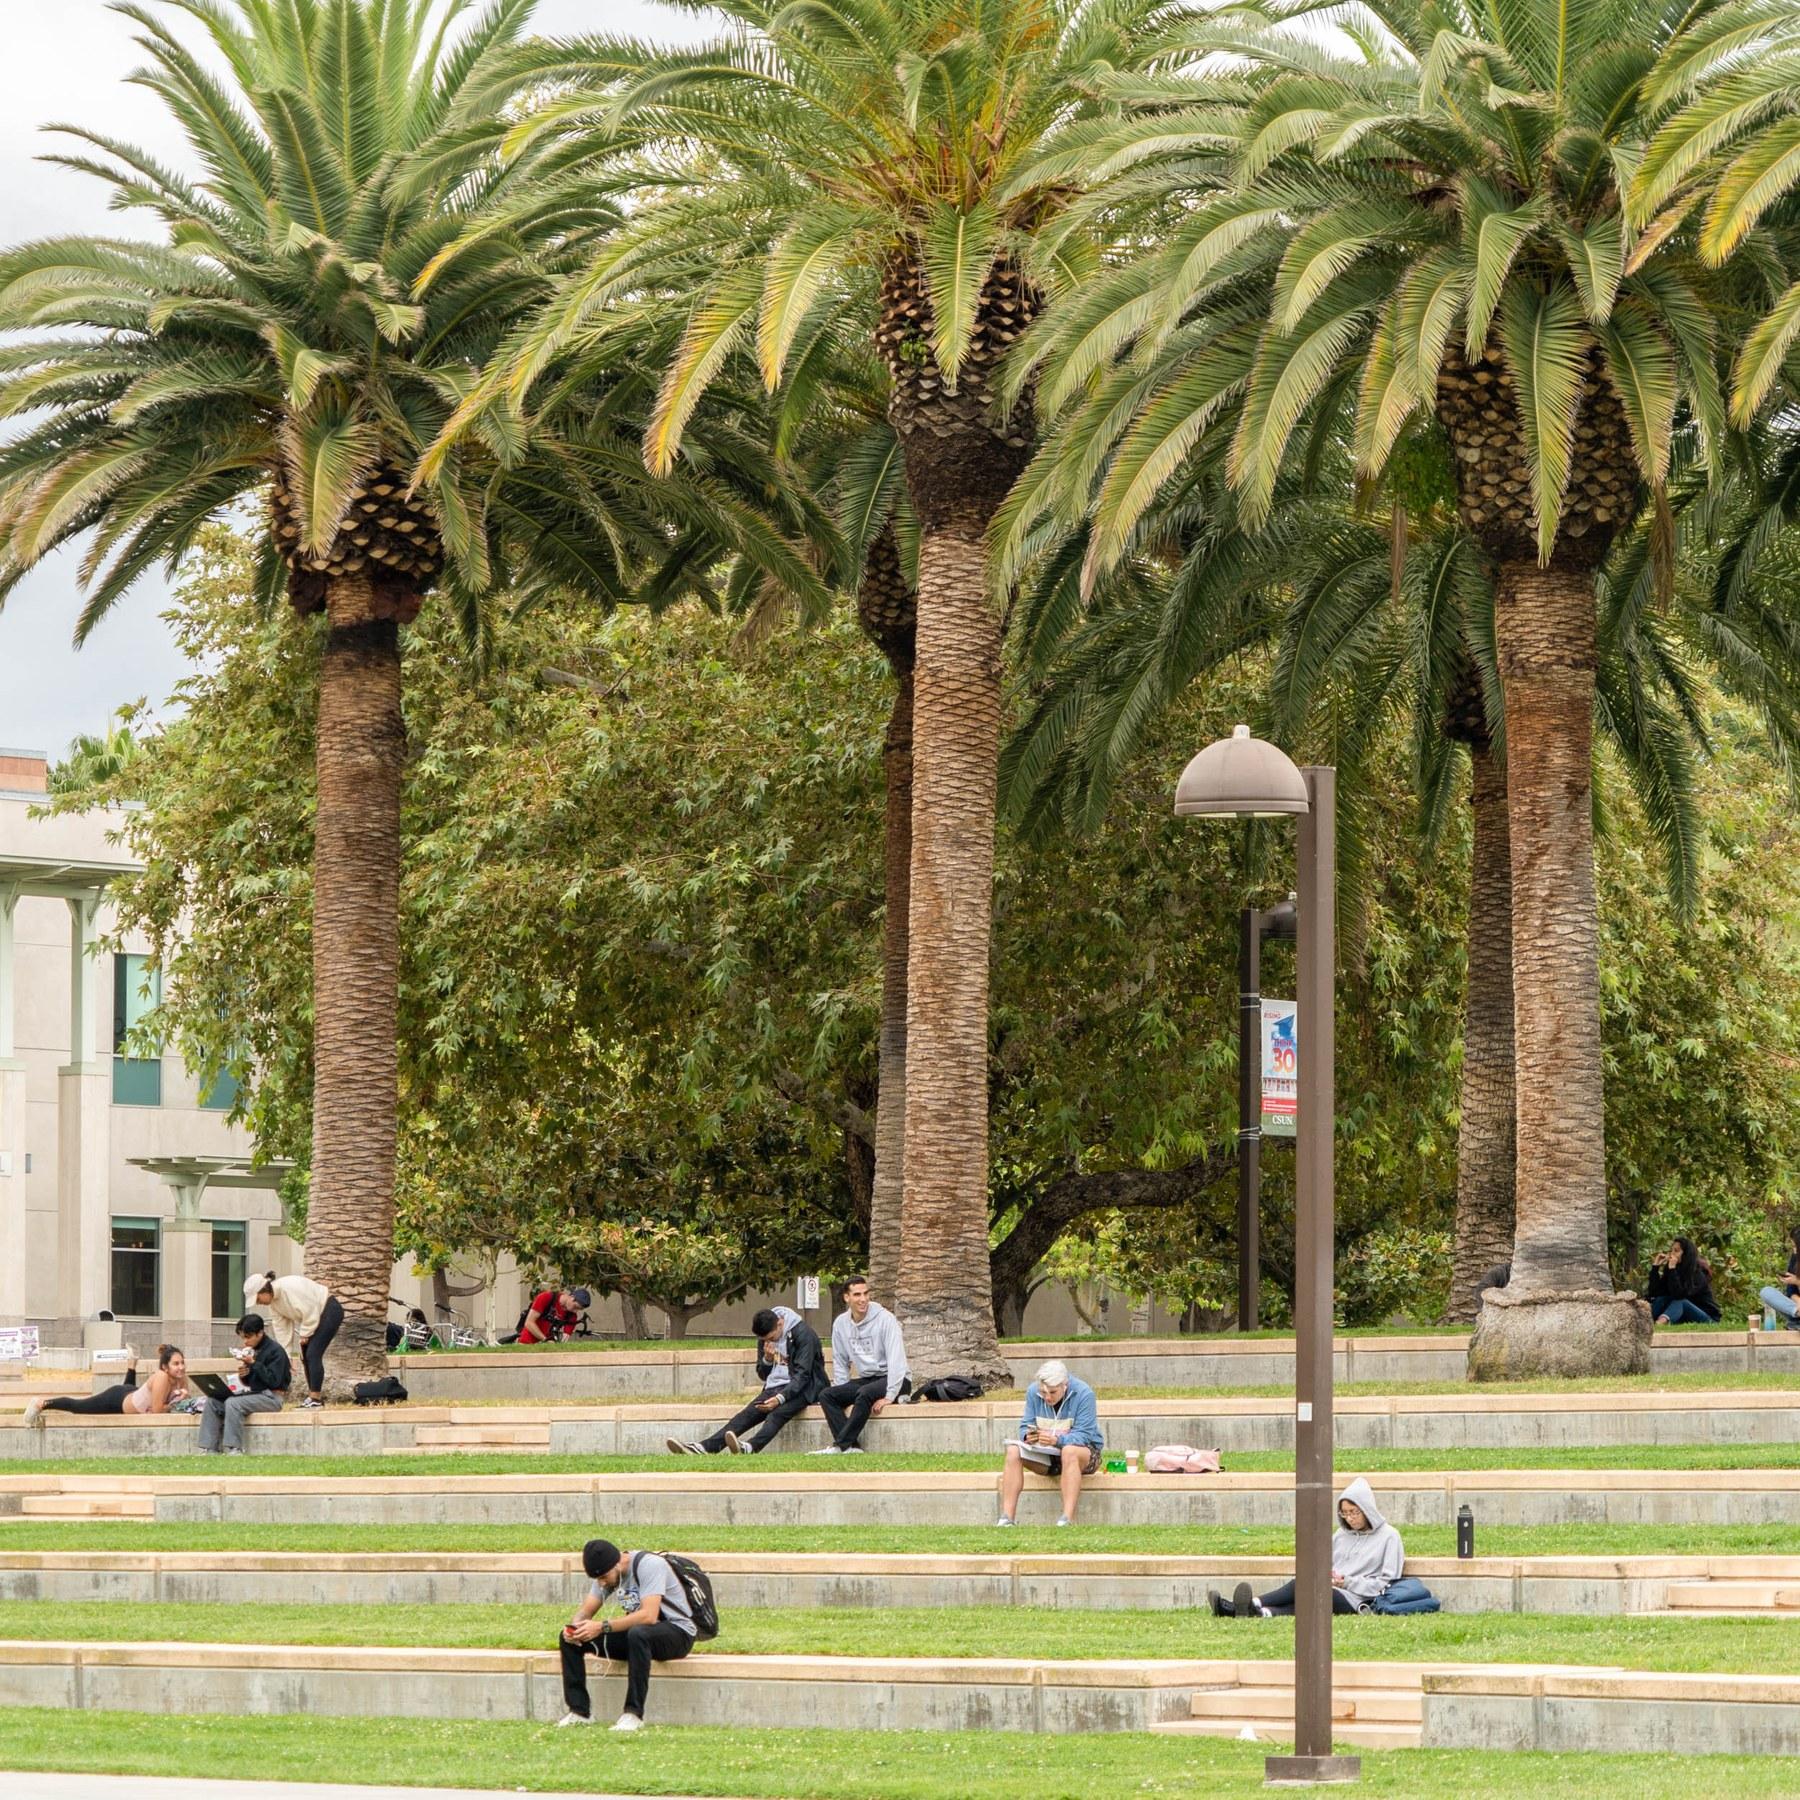 Local Com Homes For Rent: Northridge, Los Angeles CA - Neighborhood Guide